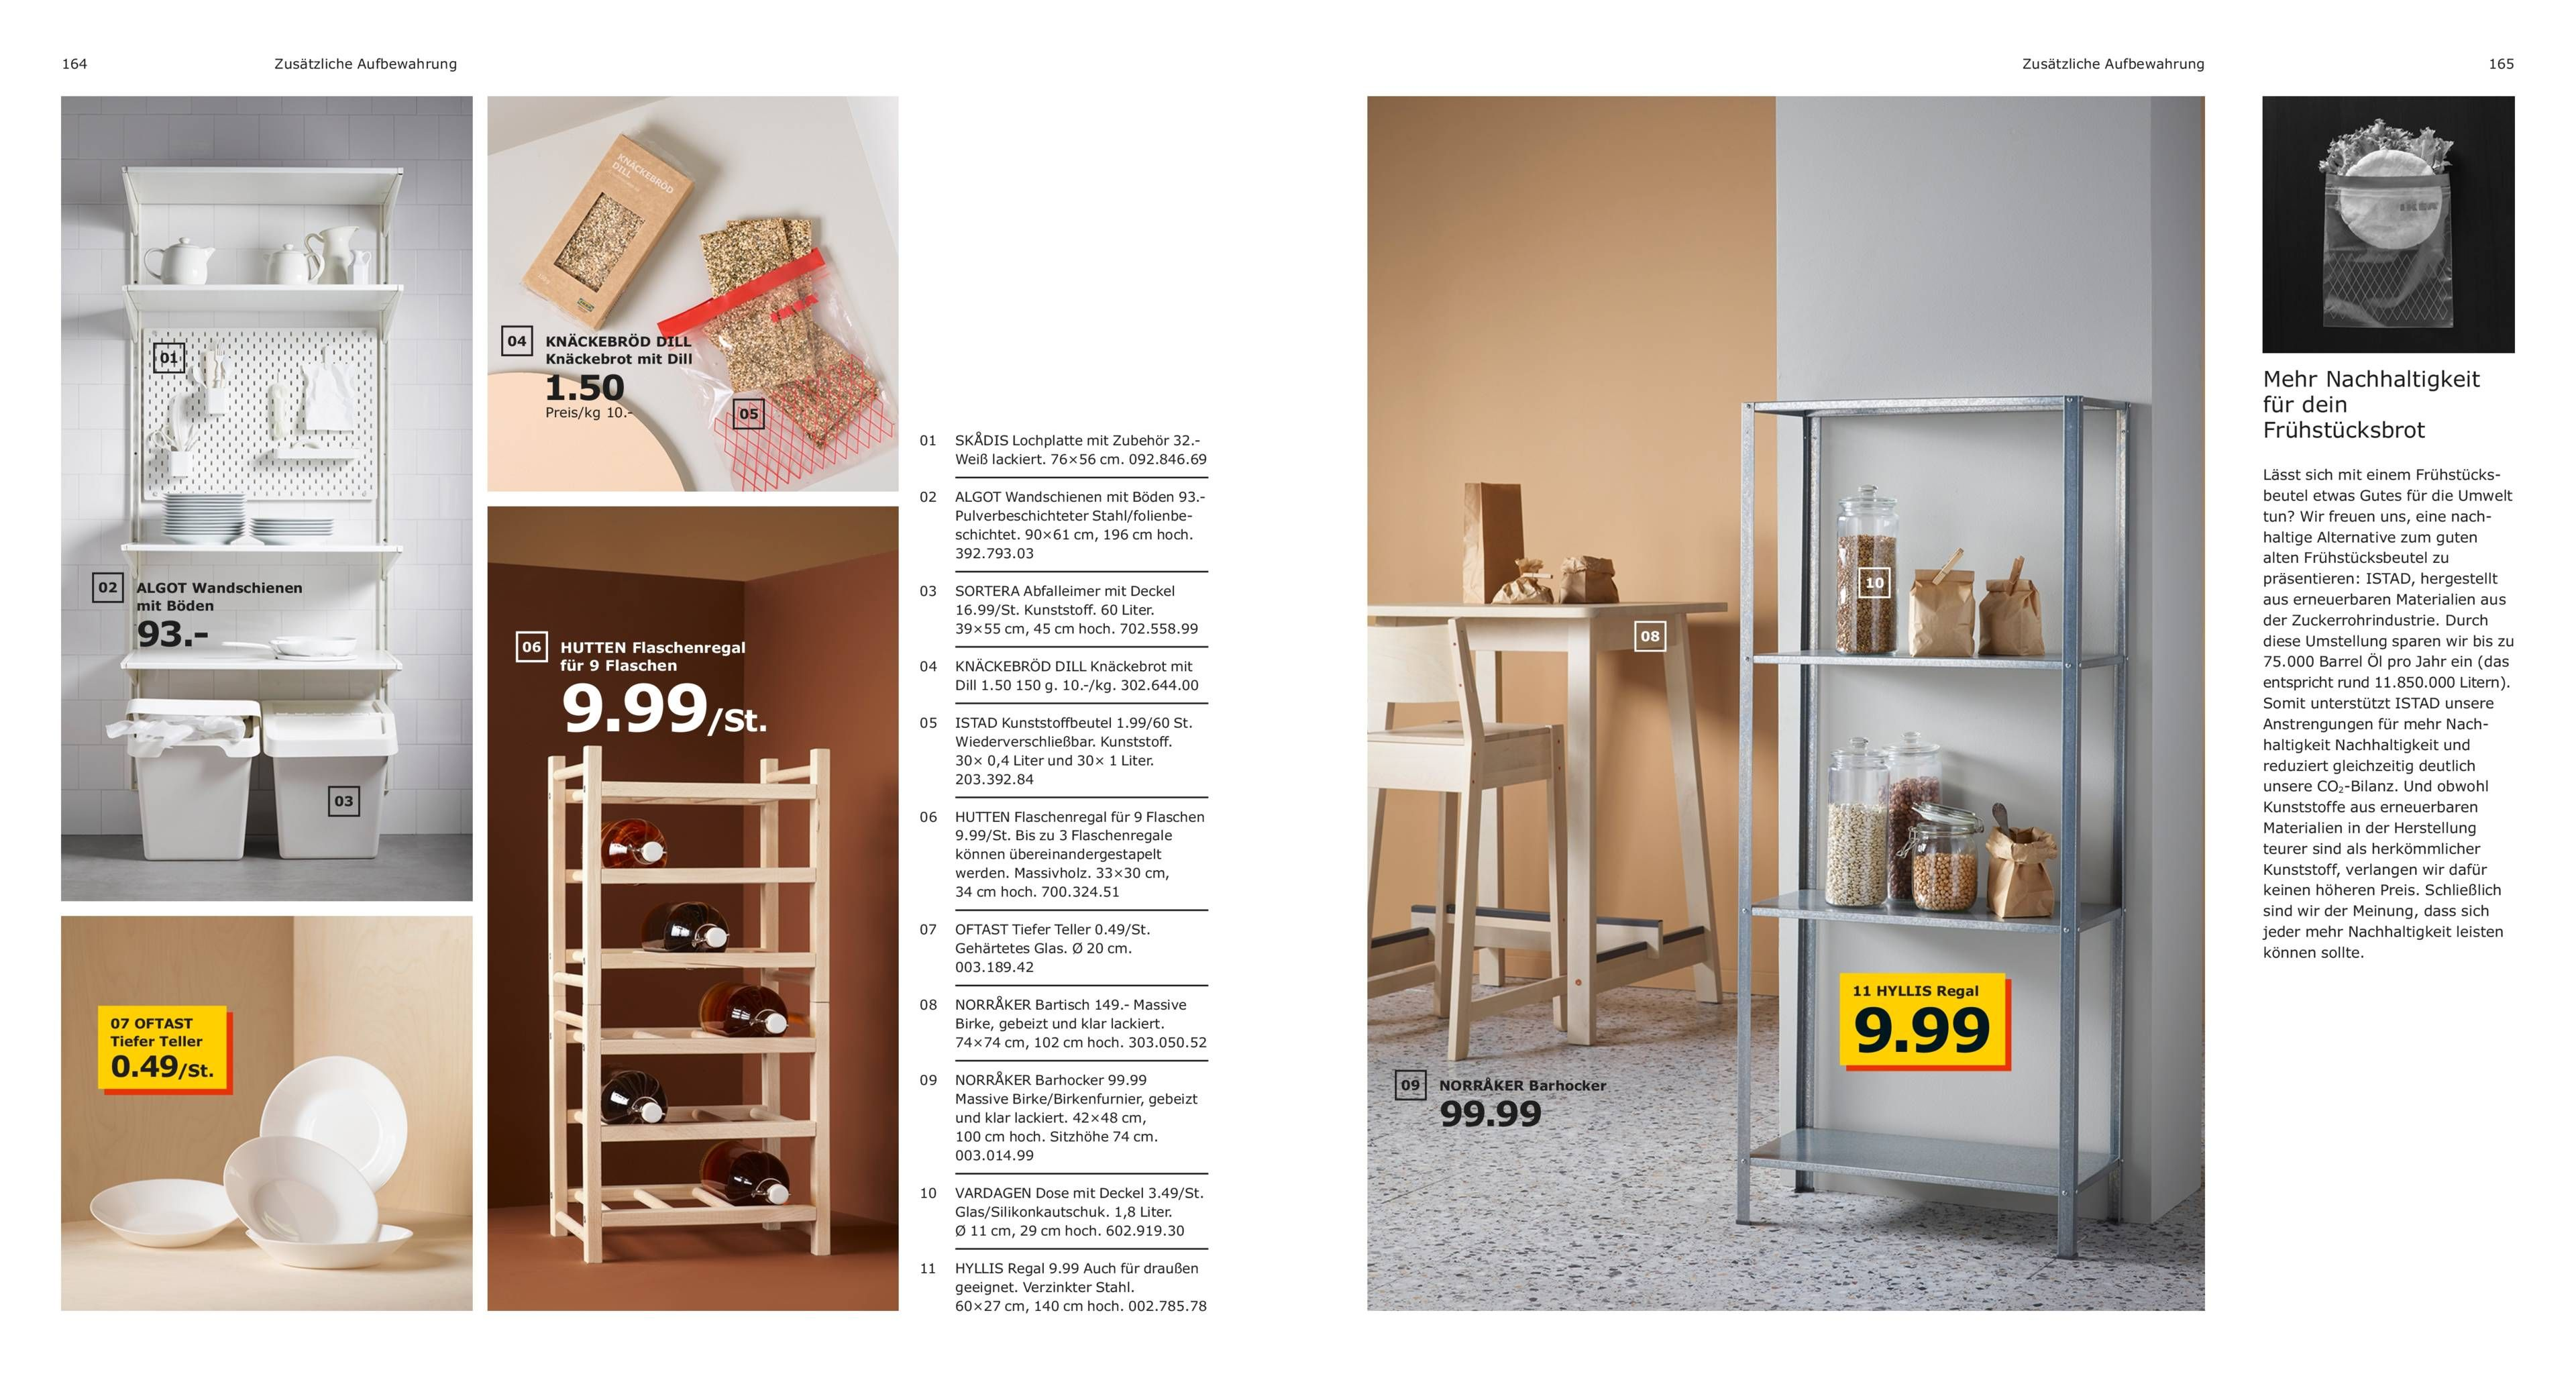 Küche - IKEA Katalog 2019 | Altbau | Ikea, Ikea küche und ...